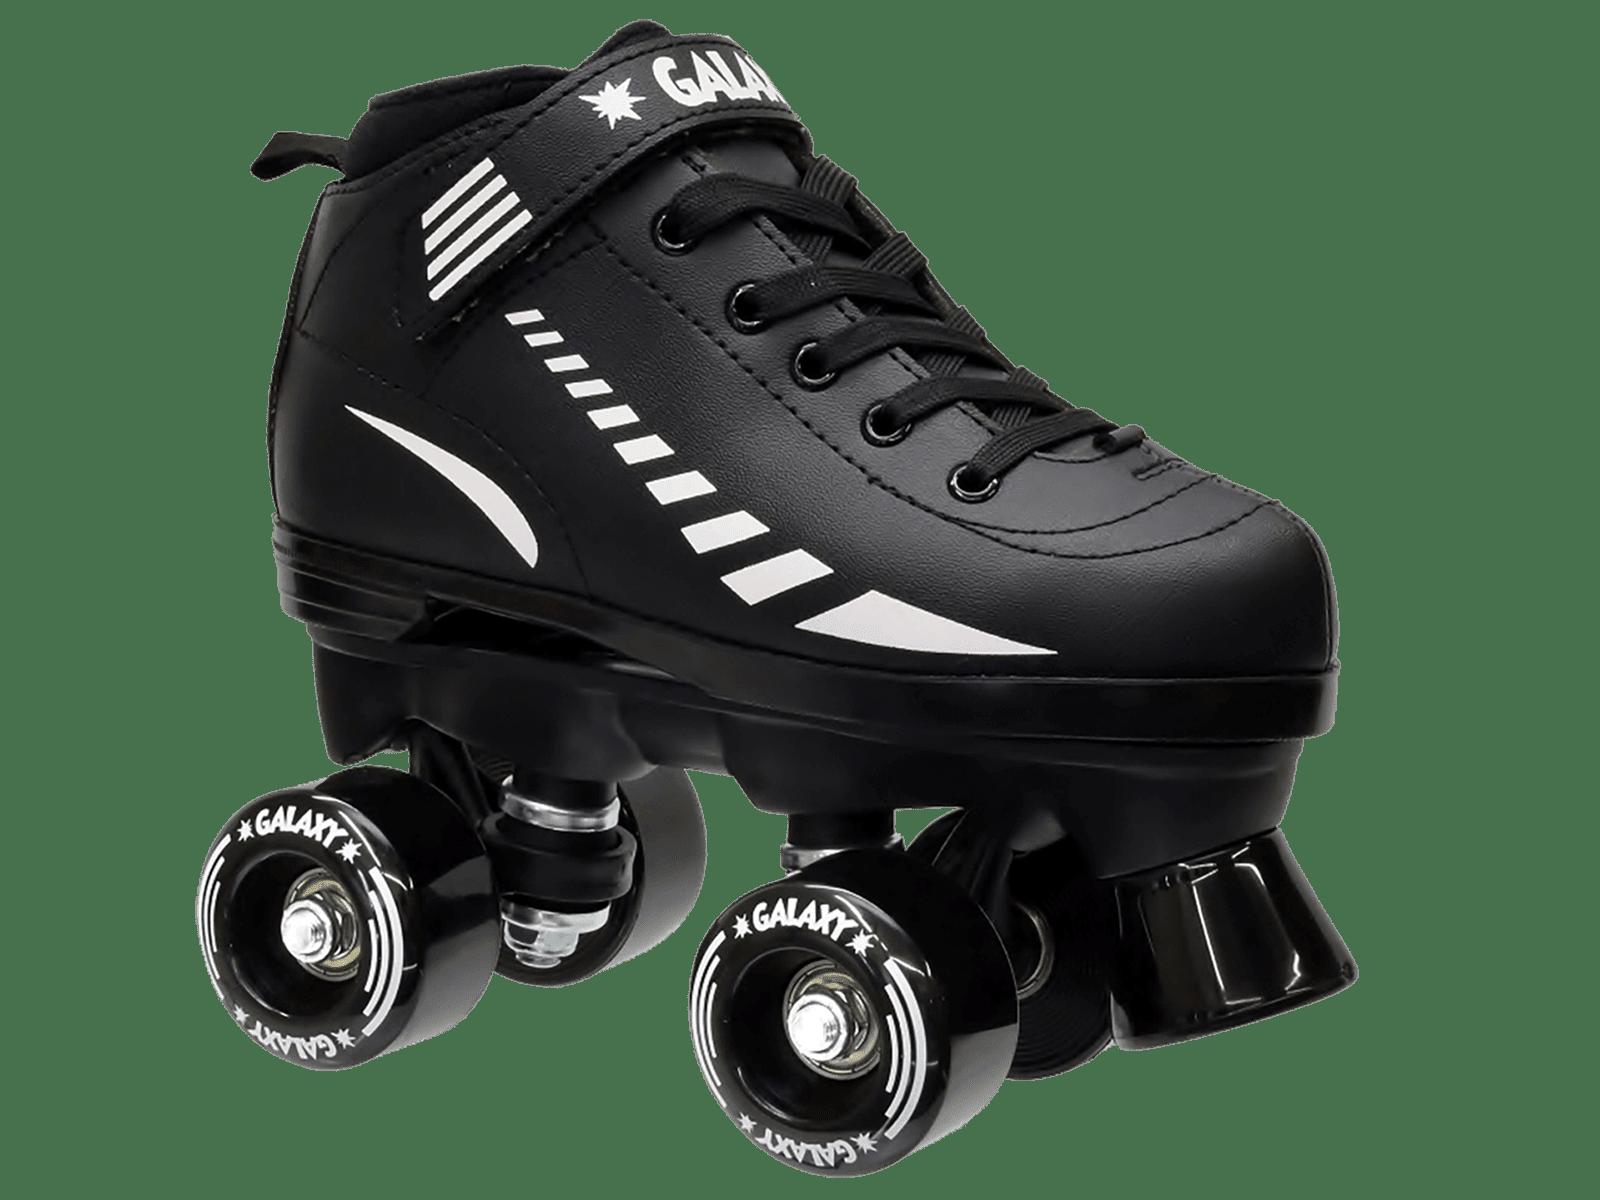 Epic Galaxy Elite Black Quad Roller Skates Package by Epic Skates